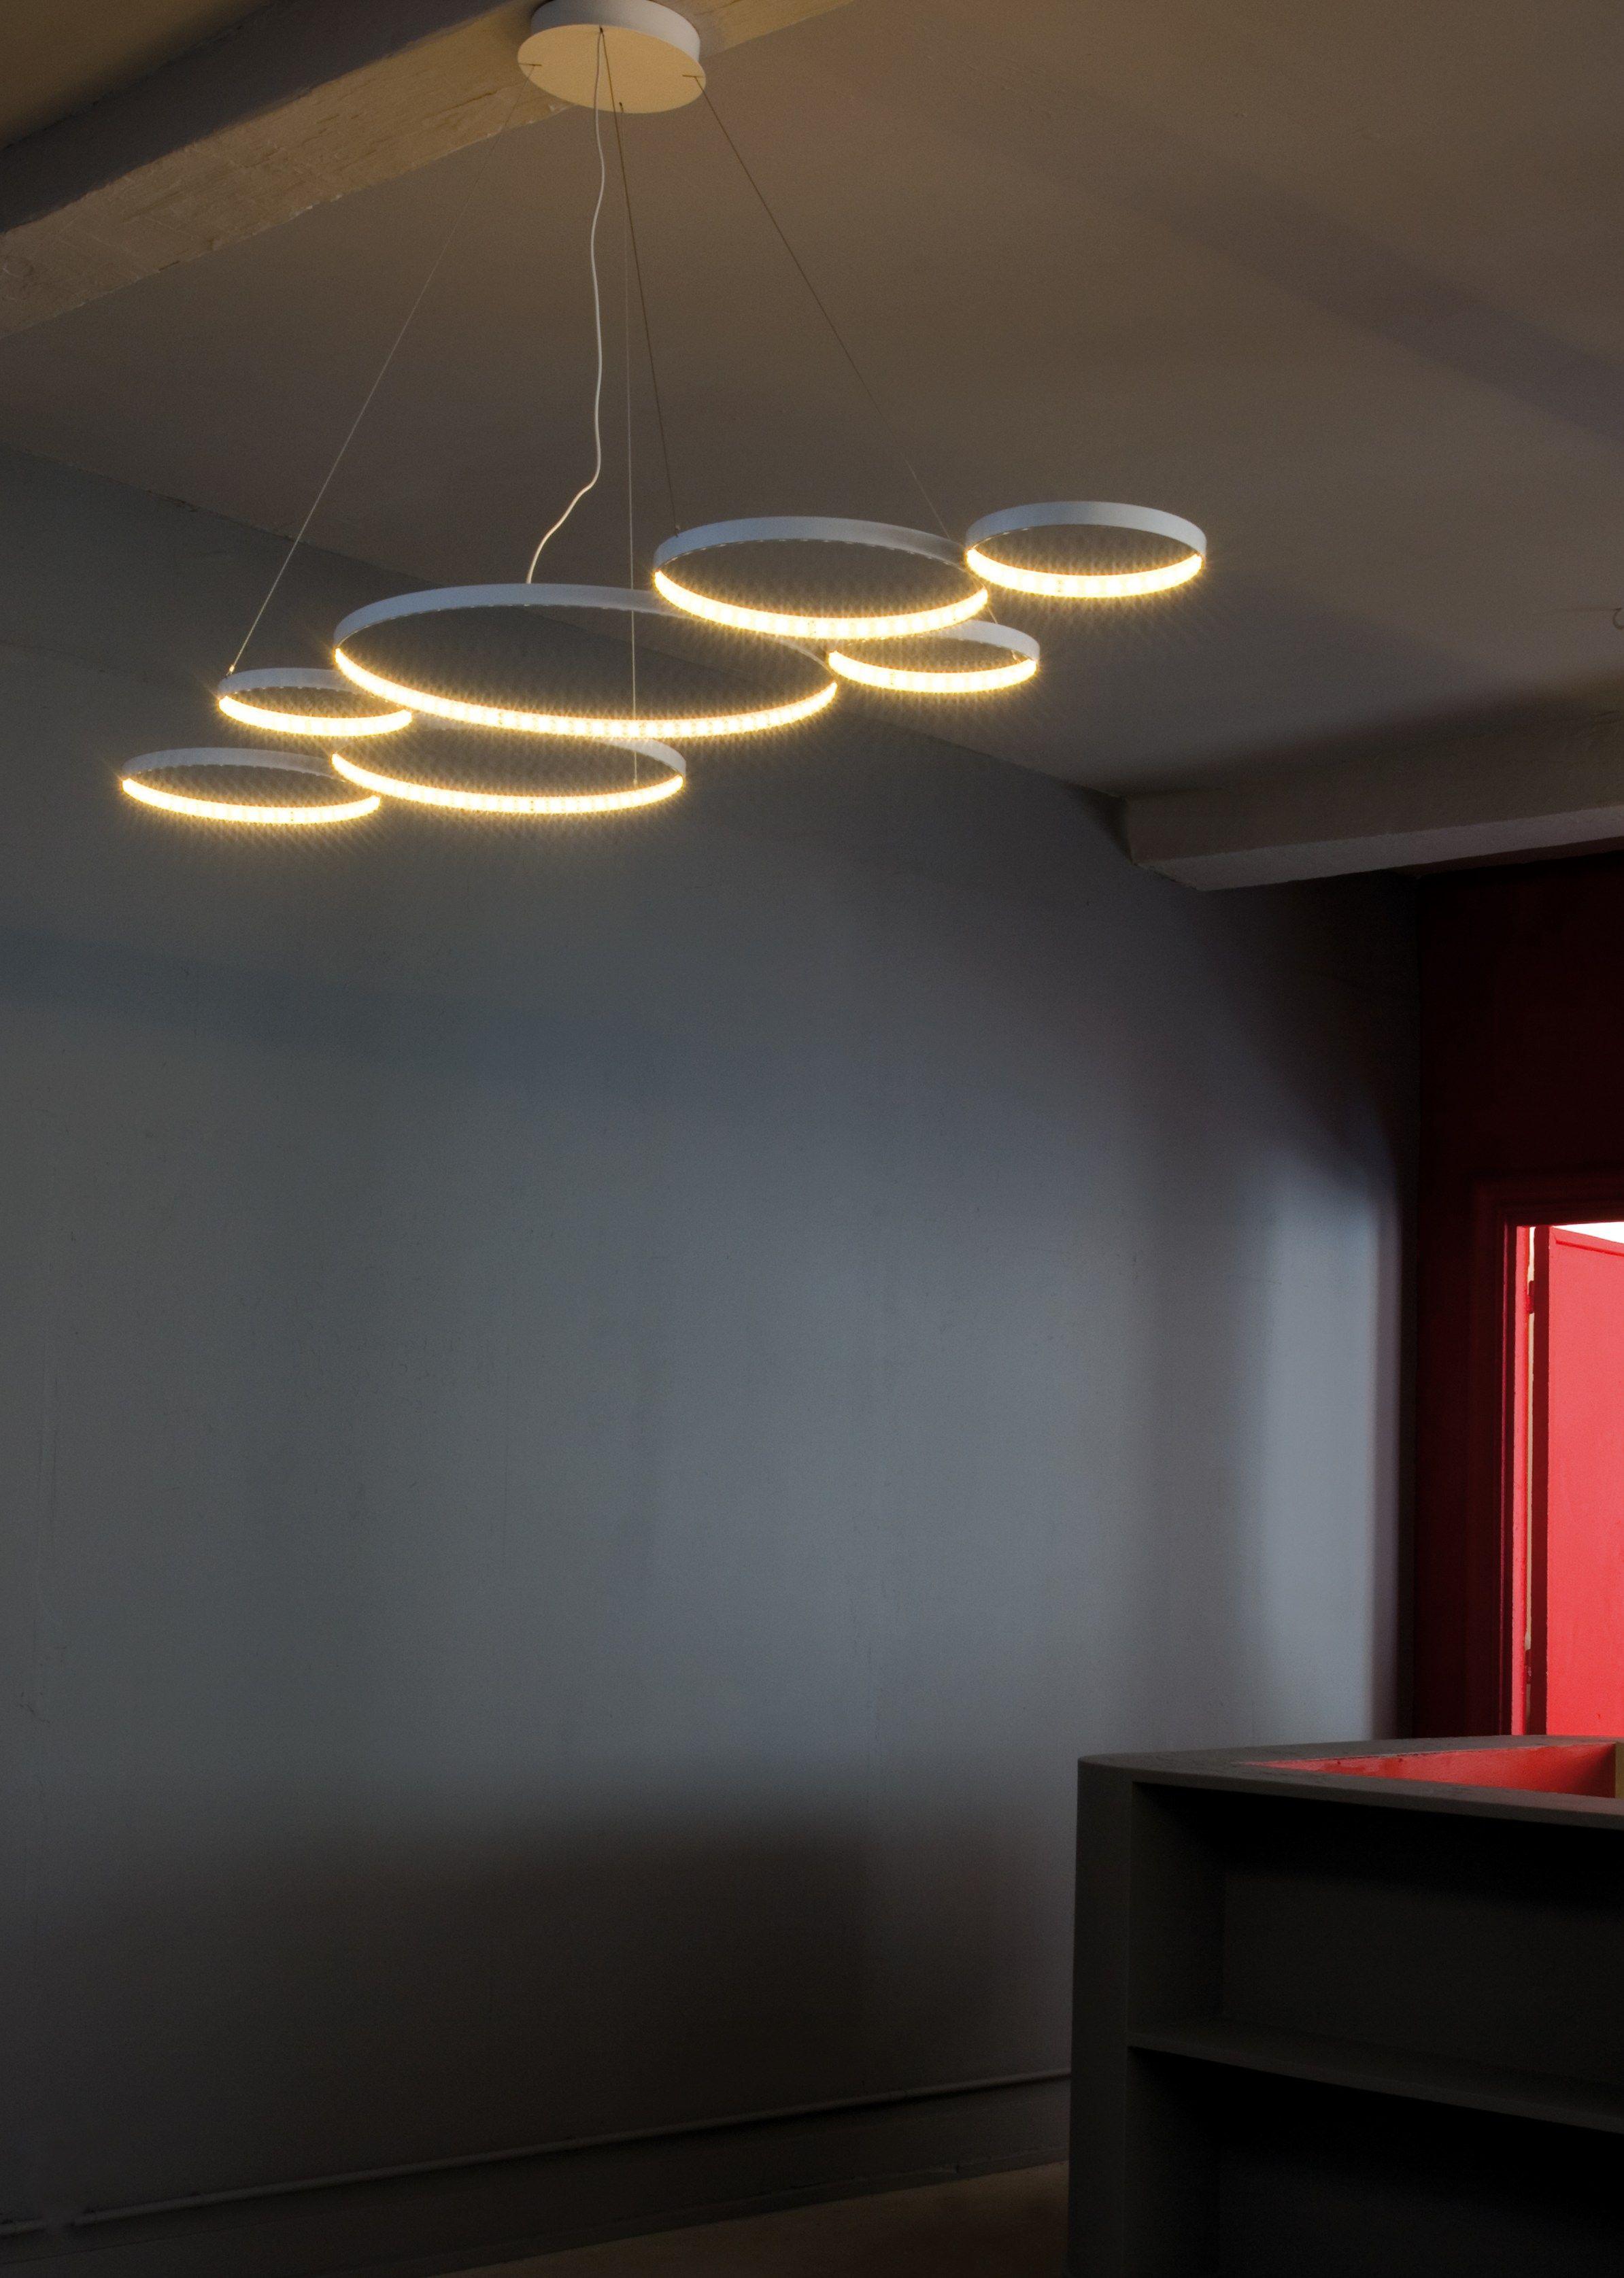 ultra8 by le deun luminaires | led | pinterest | schöne lampen